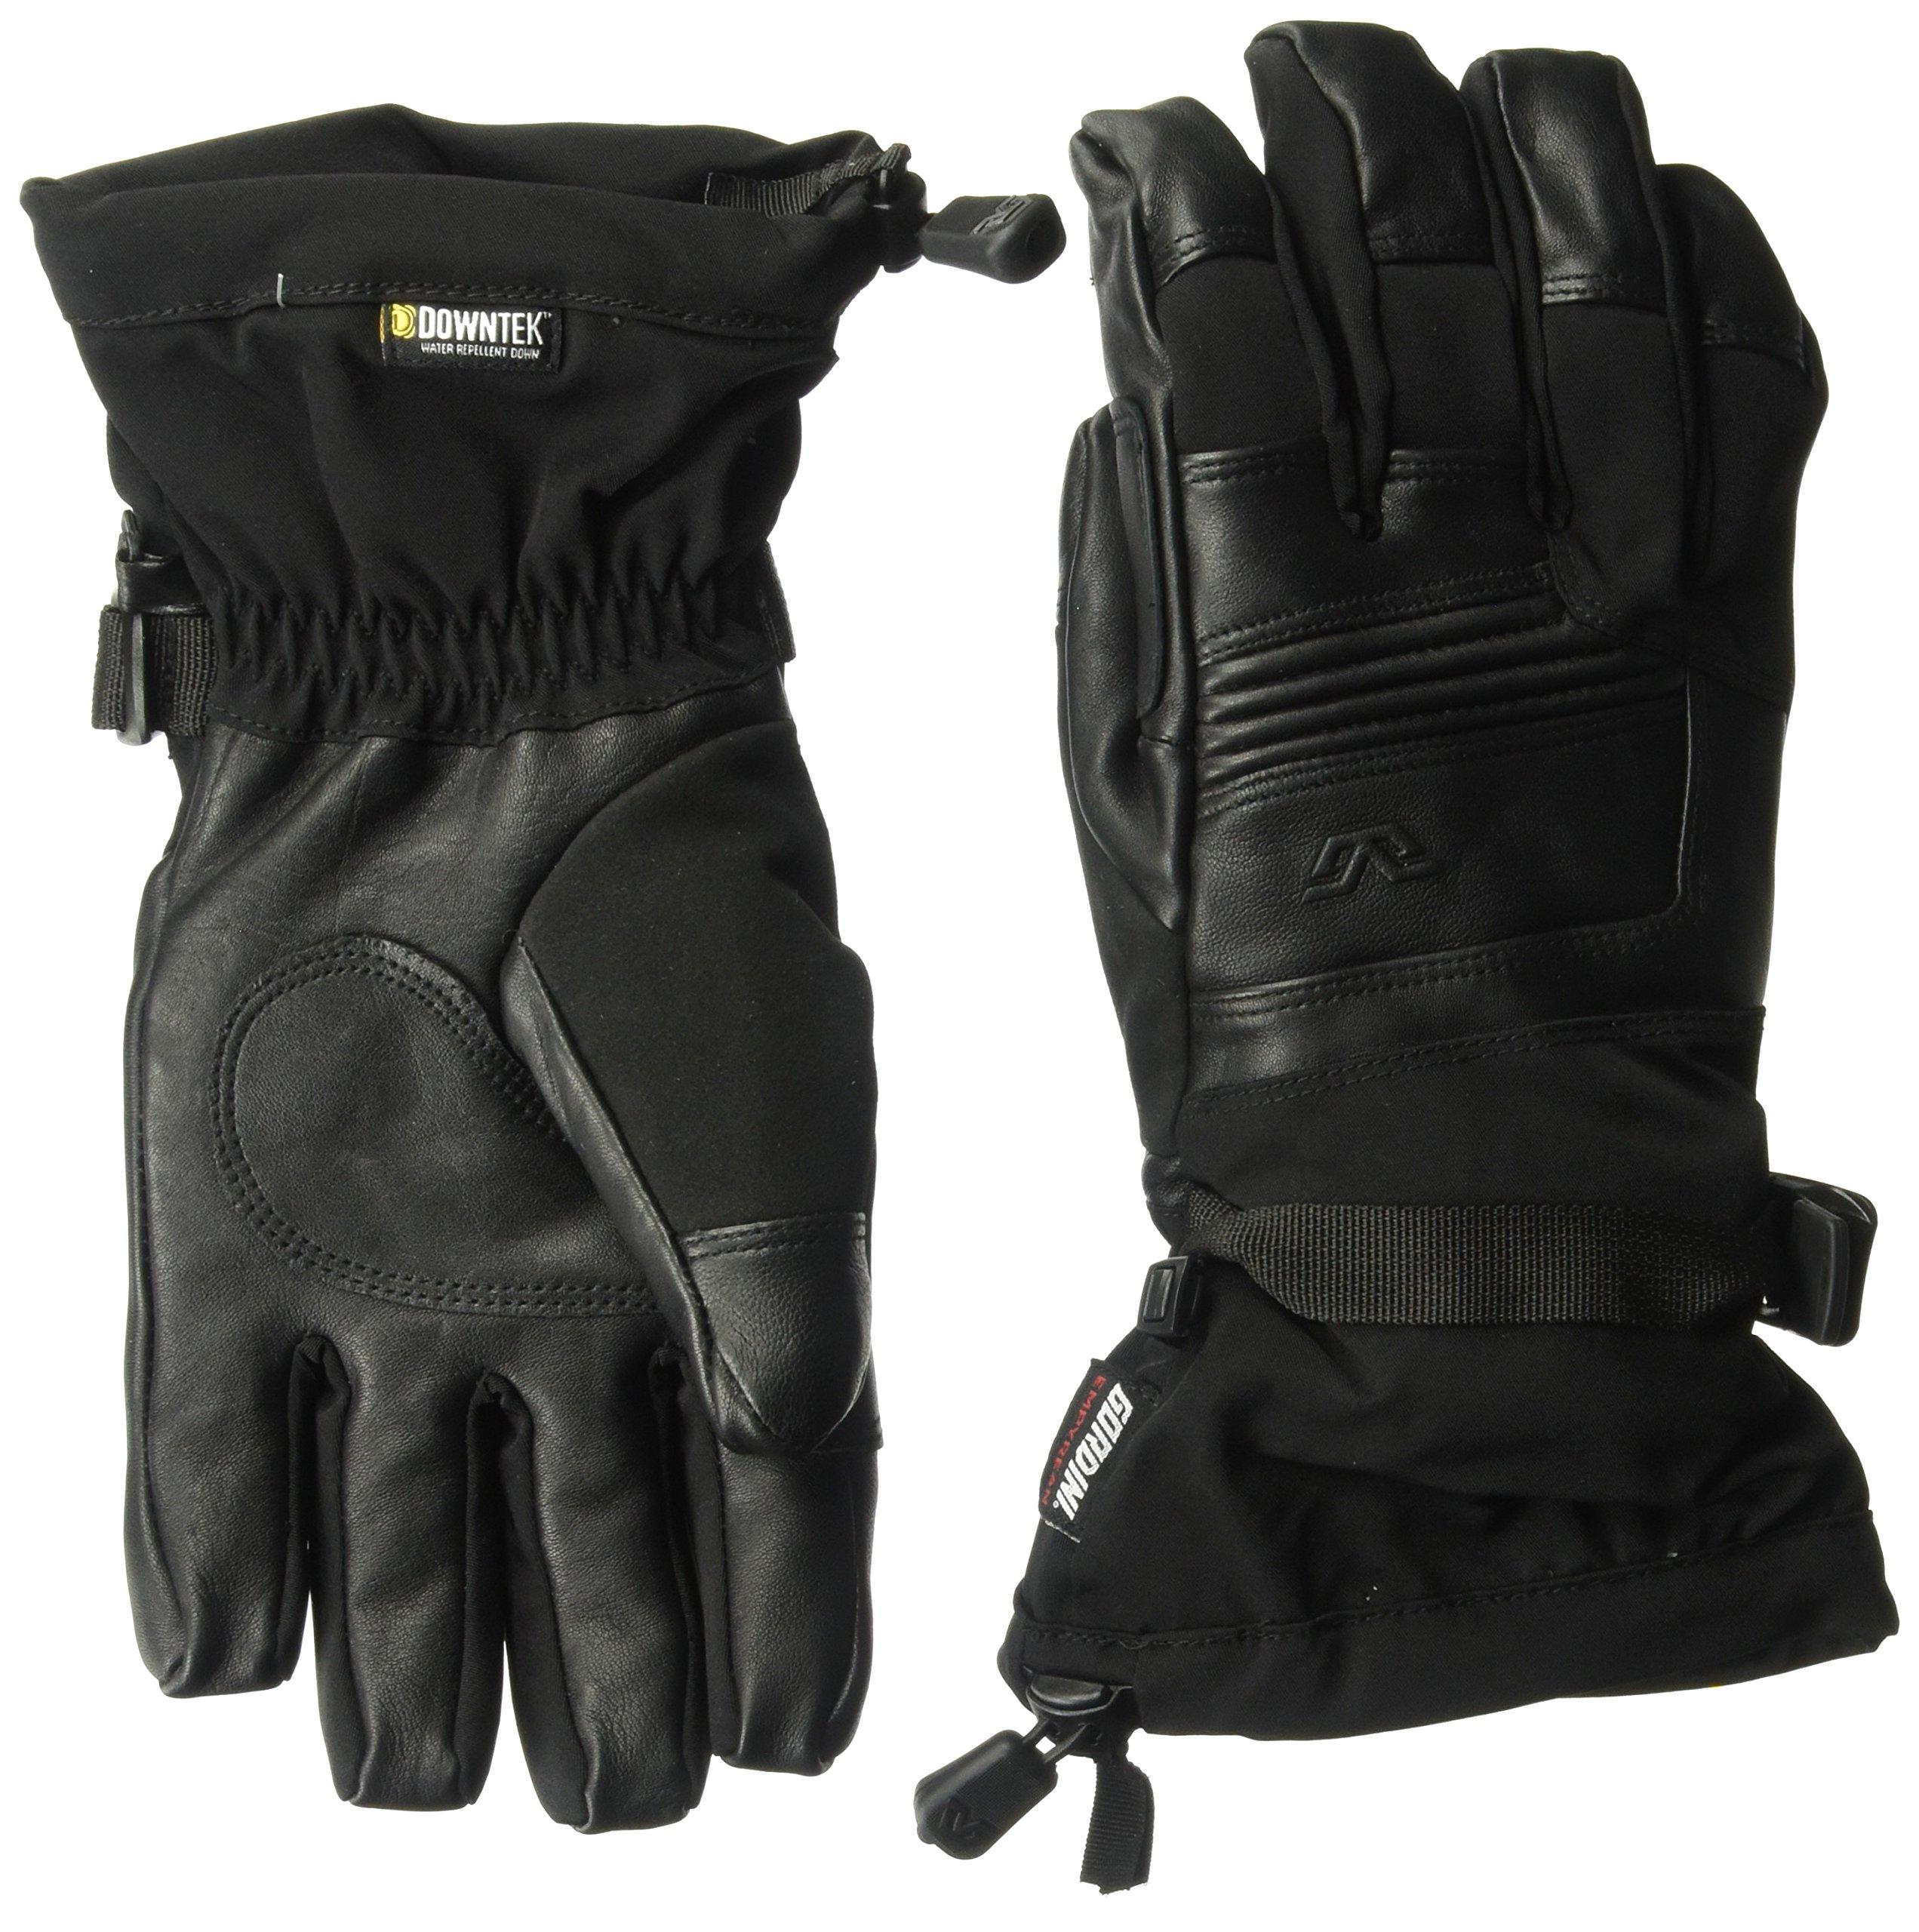 Gordini Dt Gauntlet Glove, Black, X-Large